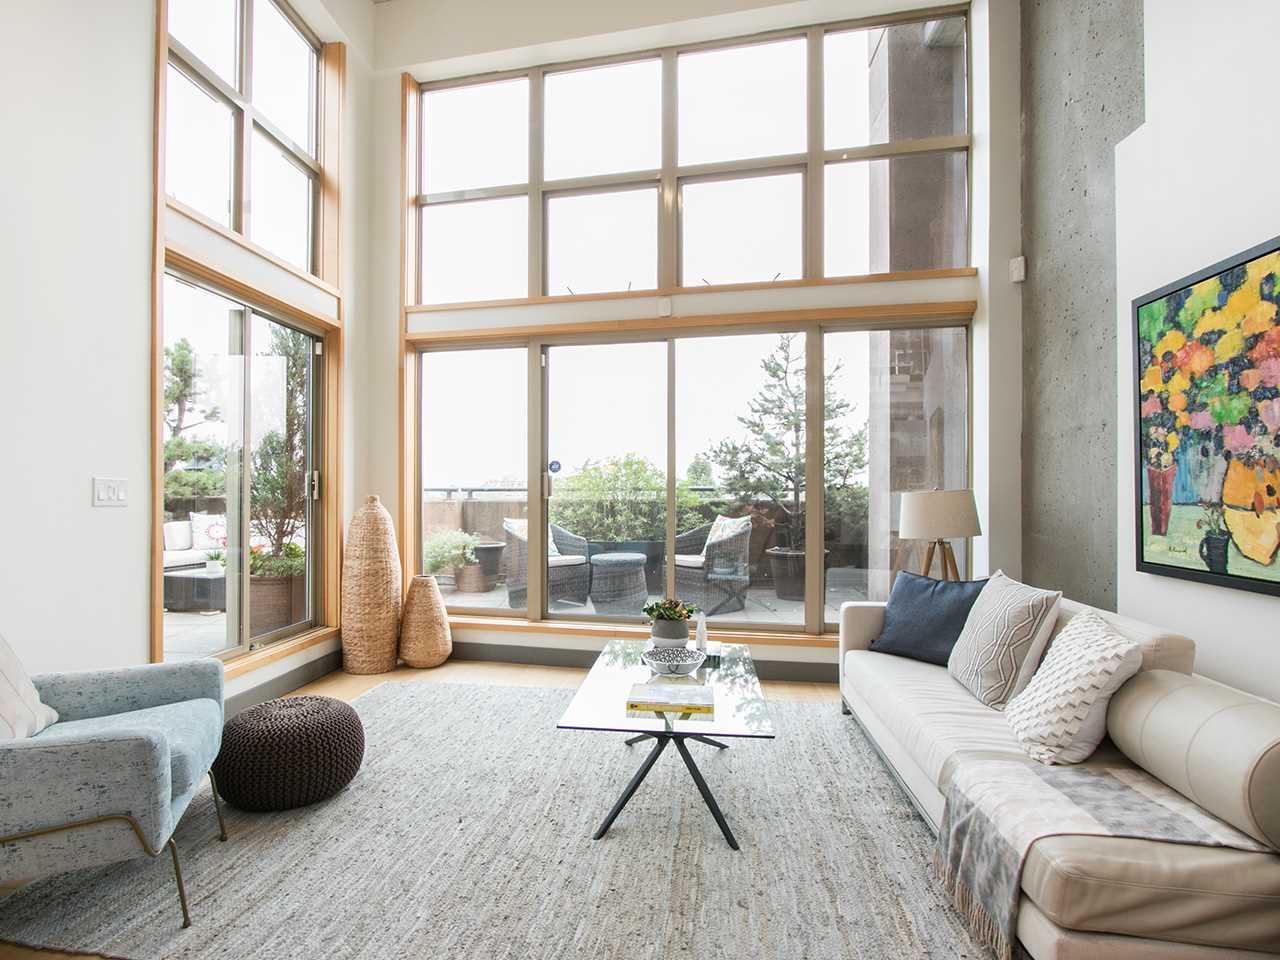 Condo Apartment at 403 1529 W 6TH AVENUE, Unit 403, Vancouver West, British Columbia. Image 1